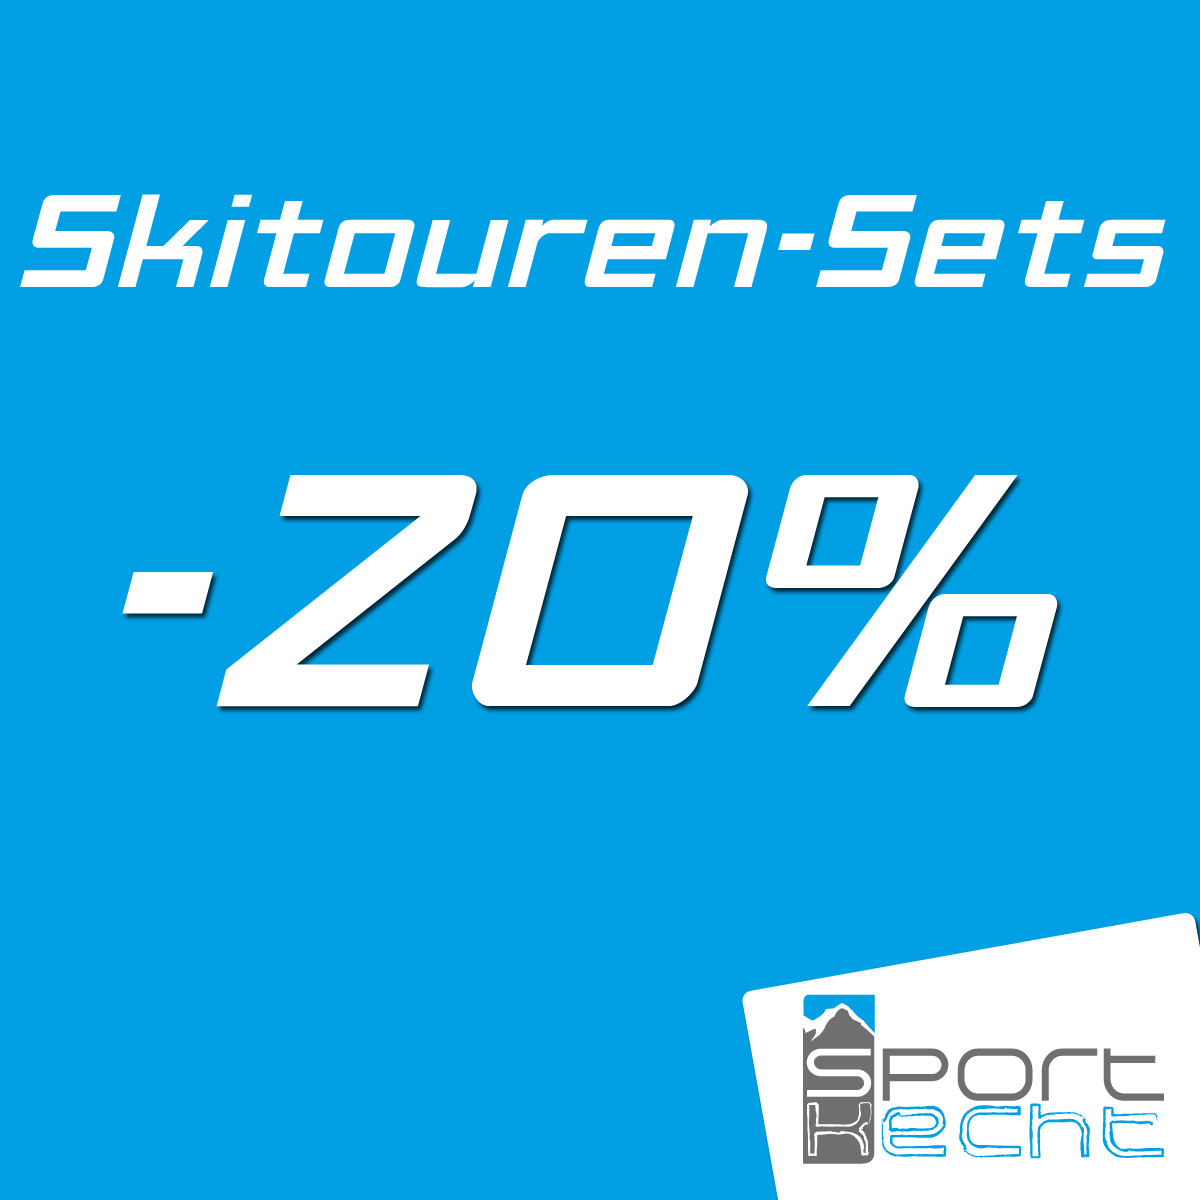 Skitourensets-20Prozent